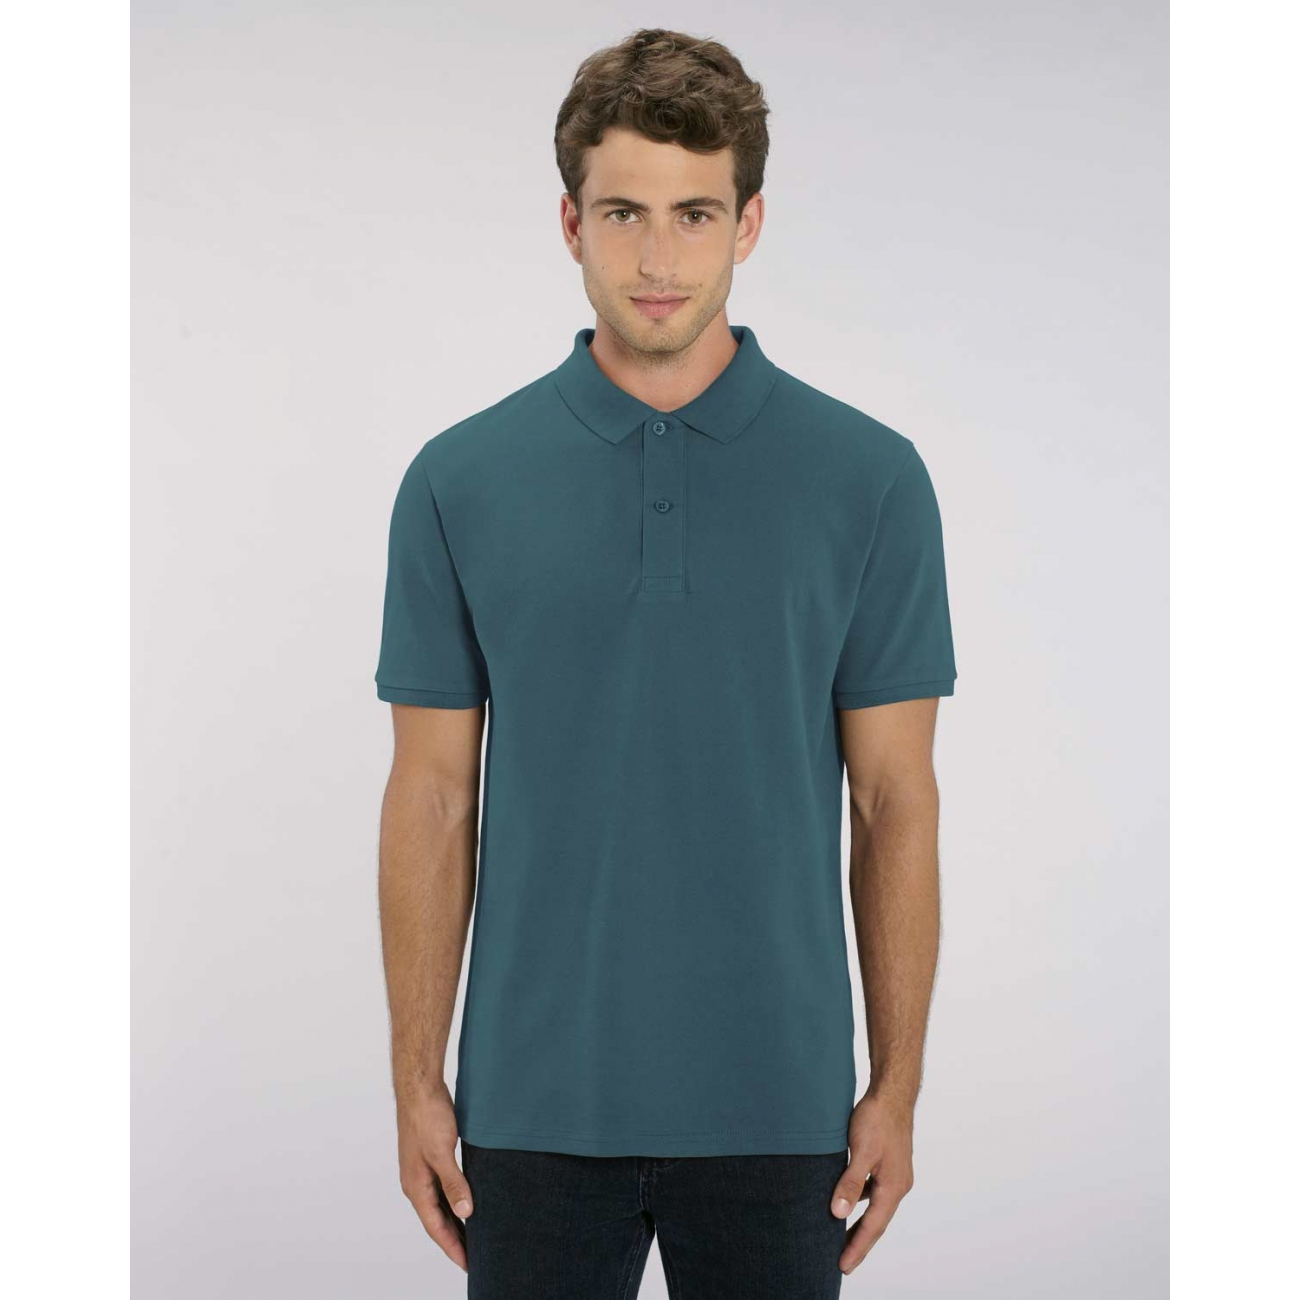 https://tee-shirt-bio.com/7081-thickbox_default/polo-homme-bleu-canard-coton-pique-bio-dedicator-.jpg